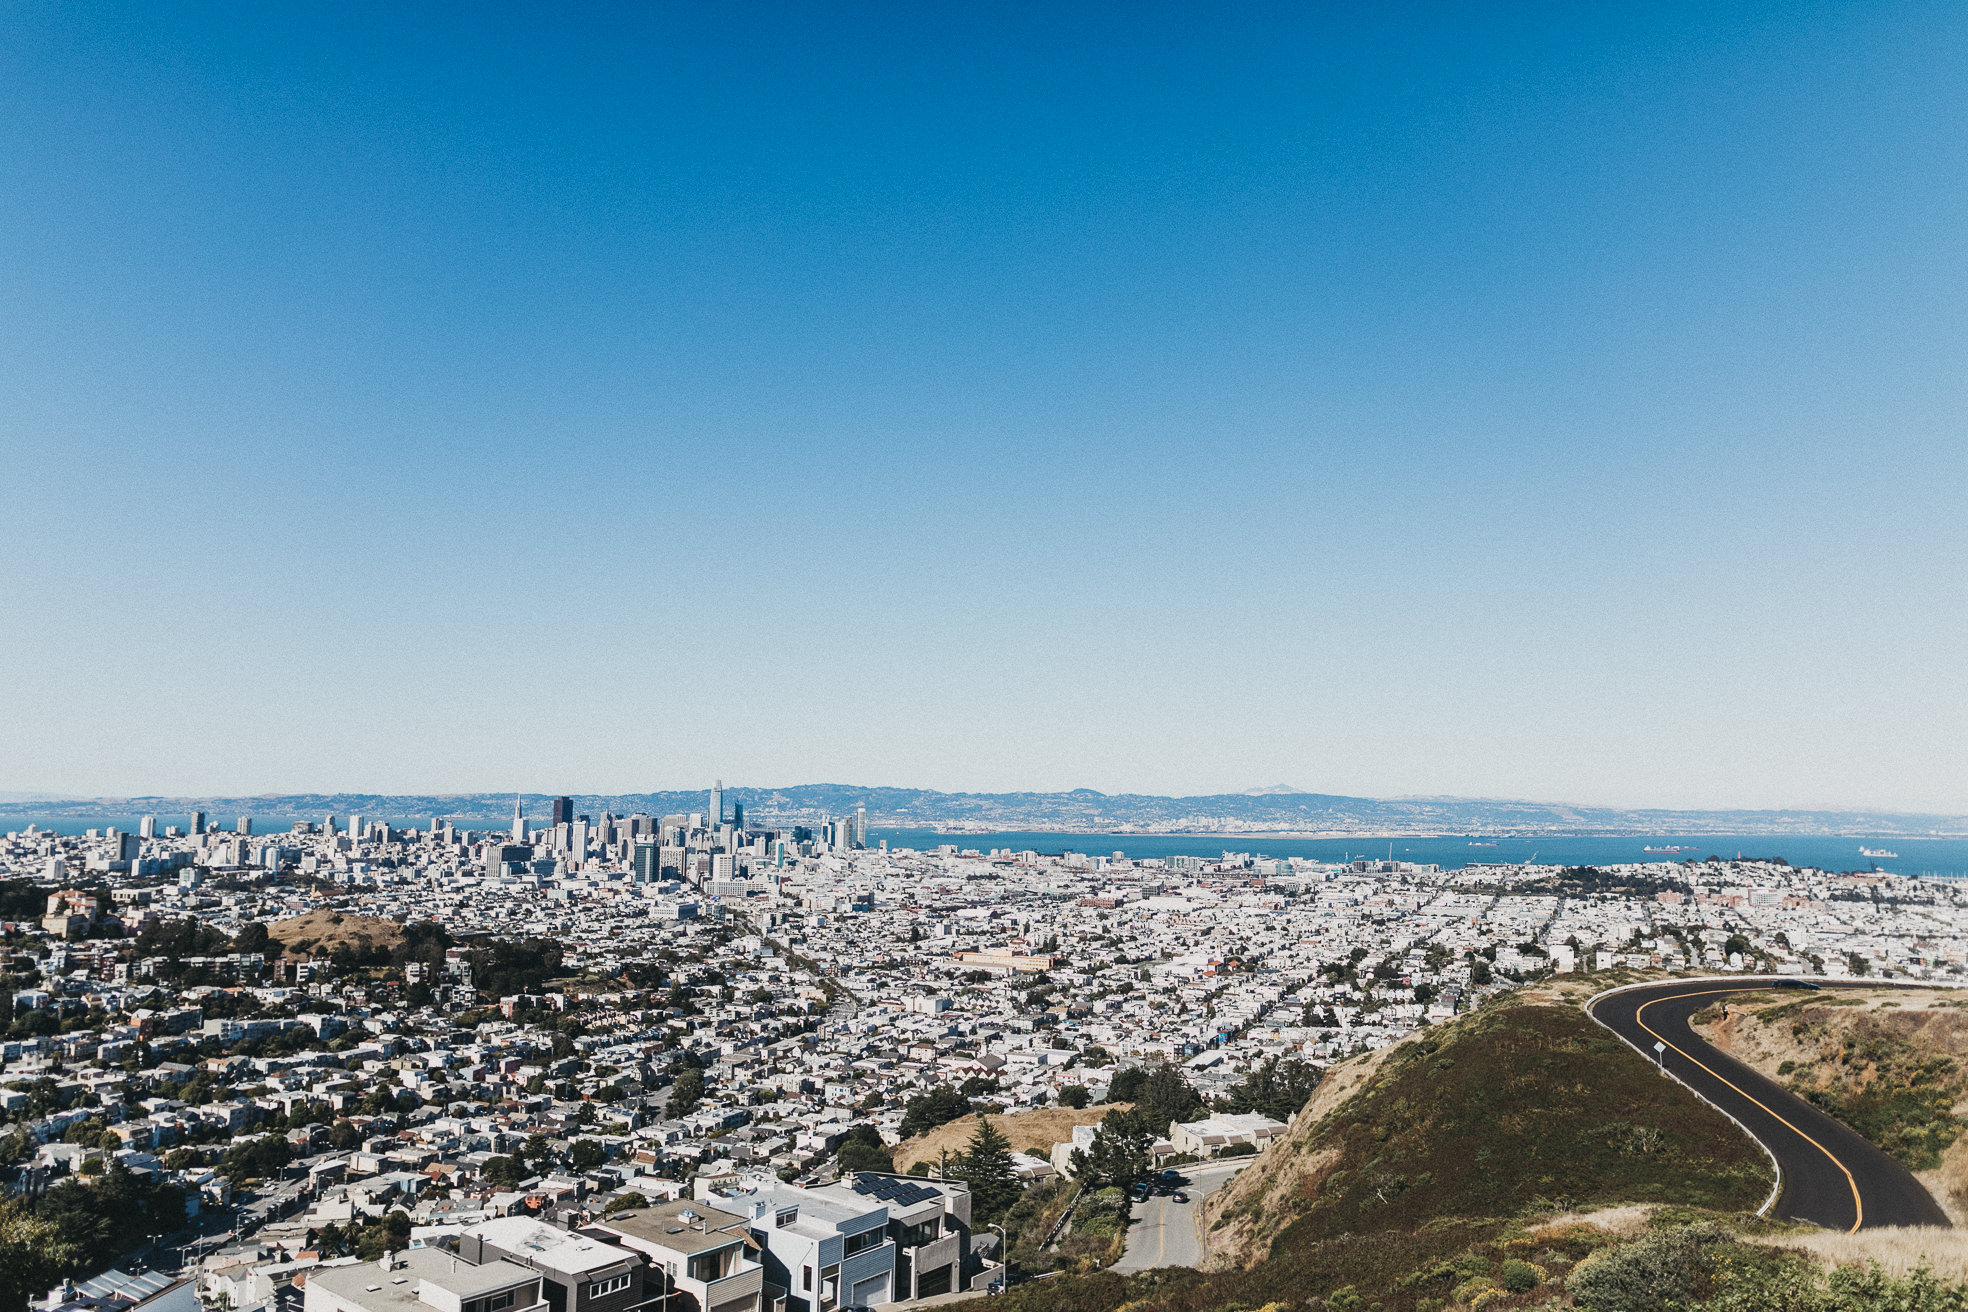 San-Francisco-BildervomLeben-5695